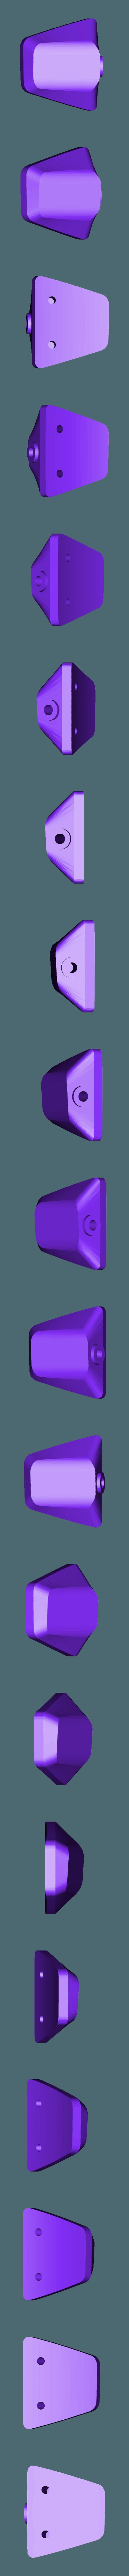 Mirrors_BaseLeft.stl Descargar archivo STL CHEVY VAN G20 RC BODY SCALER AXIAL MST TRX4 RC4WD • Modelo para imprimir en 3D, ilyakapitonov